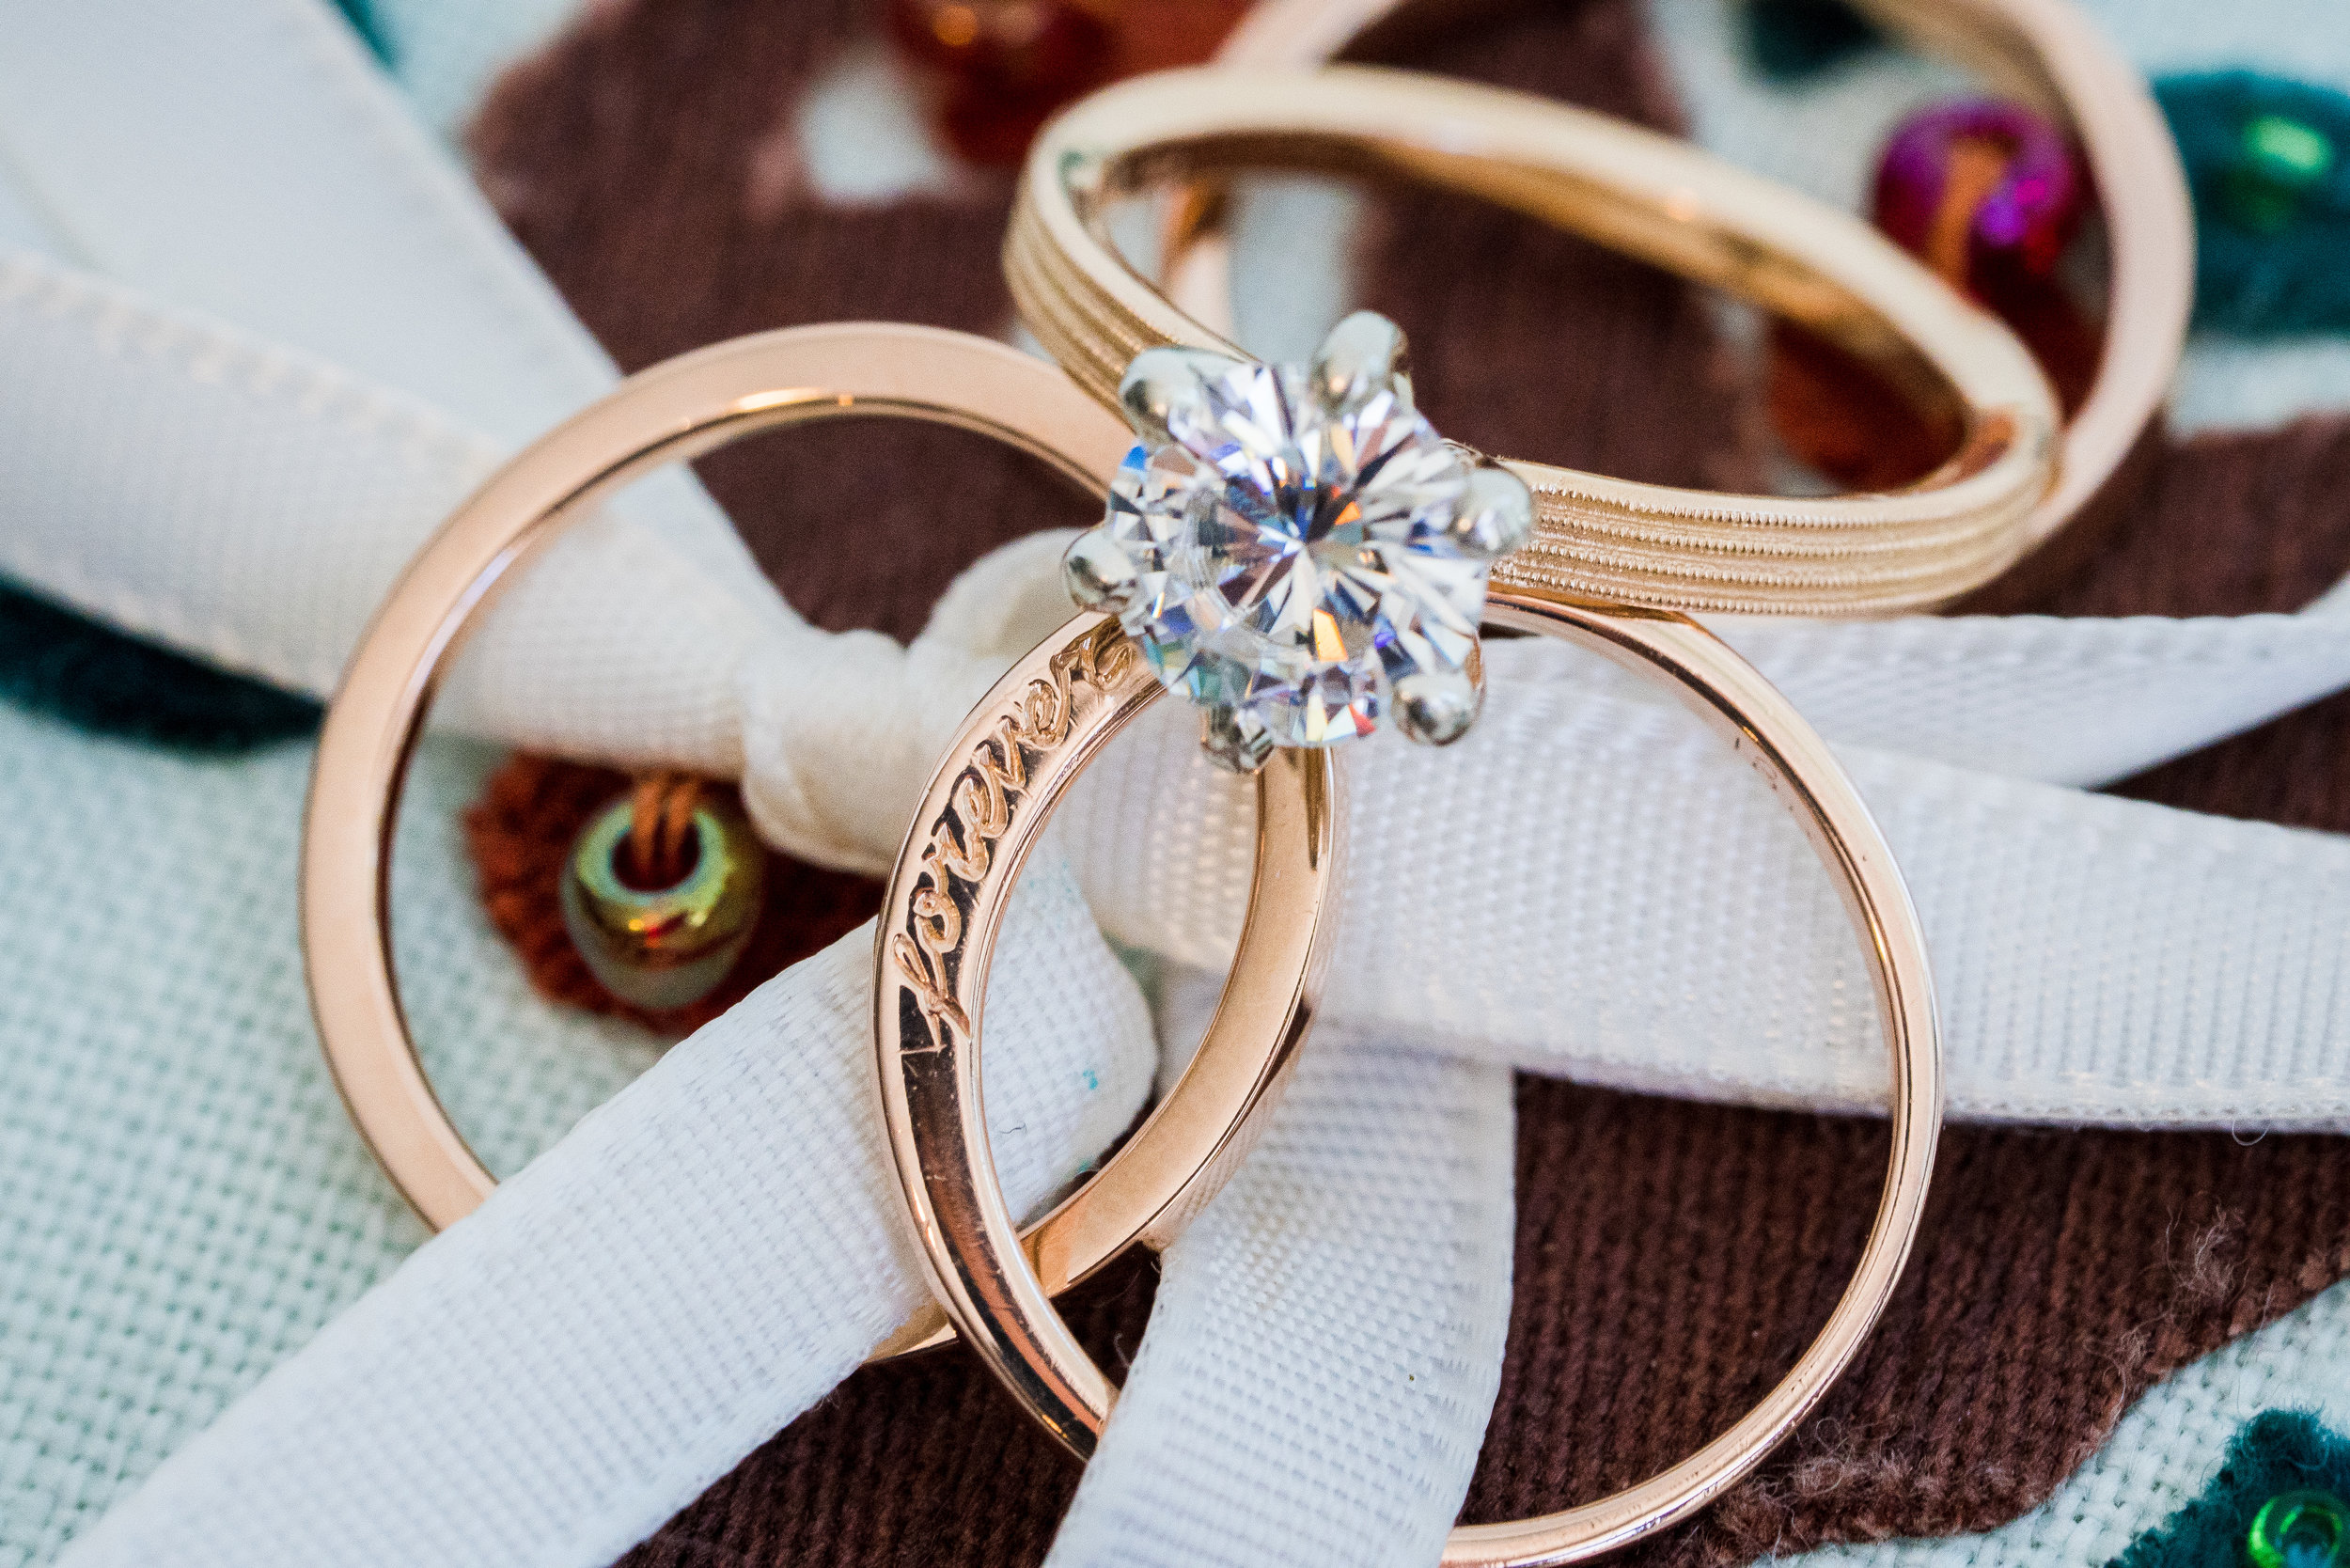 Toshi Takahashi Hawaii Photographer Wedding Engagement Rings.jpg